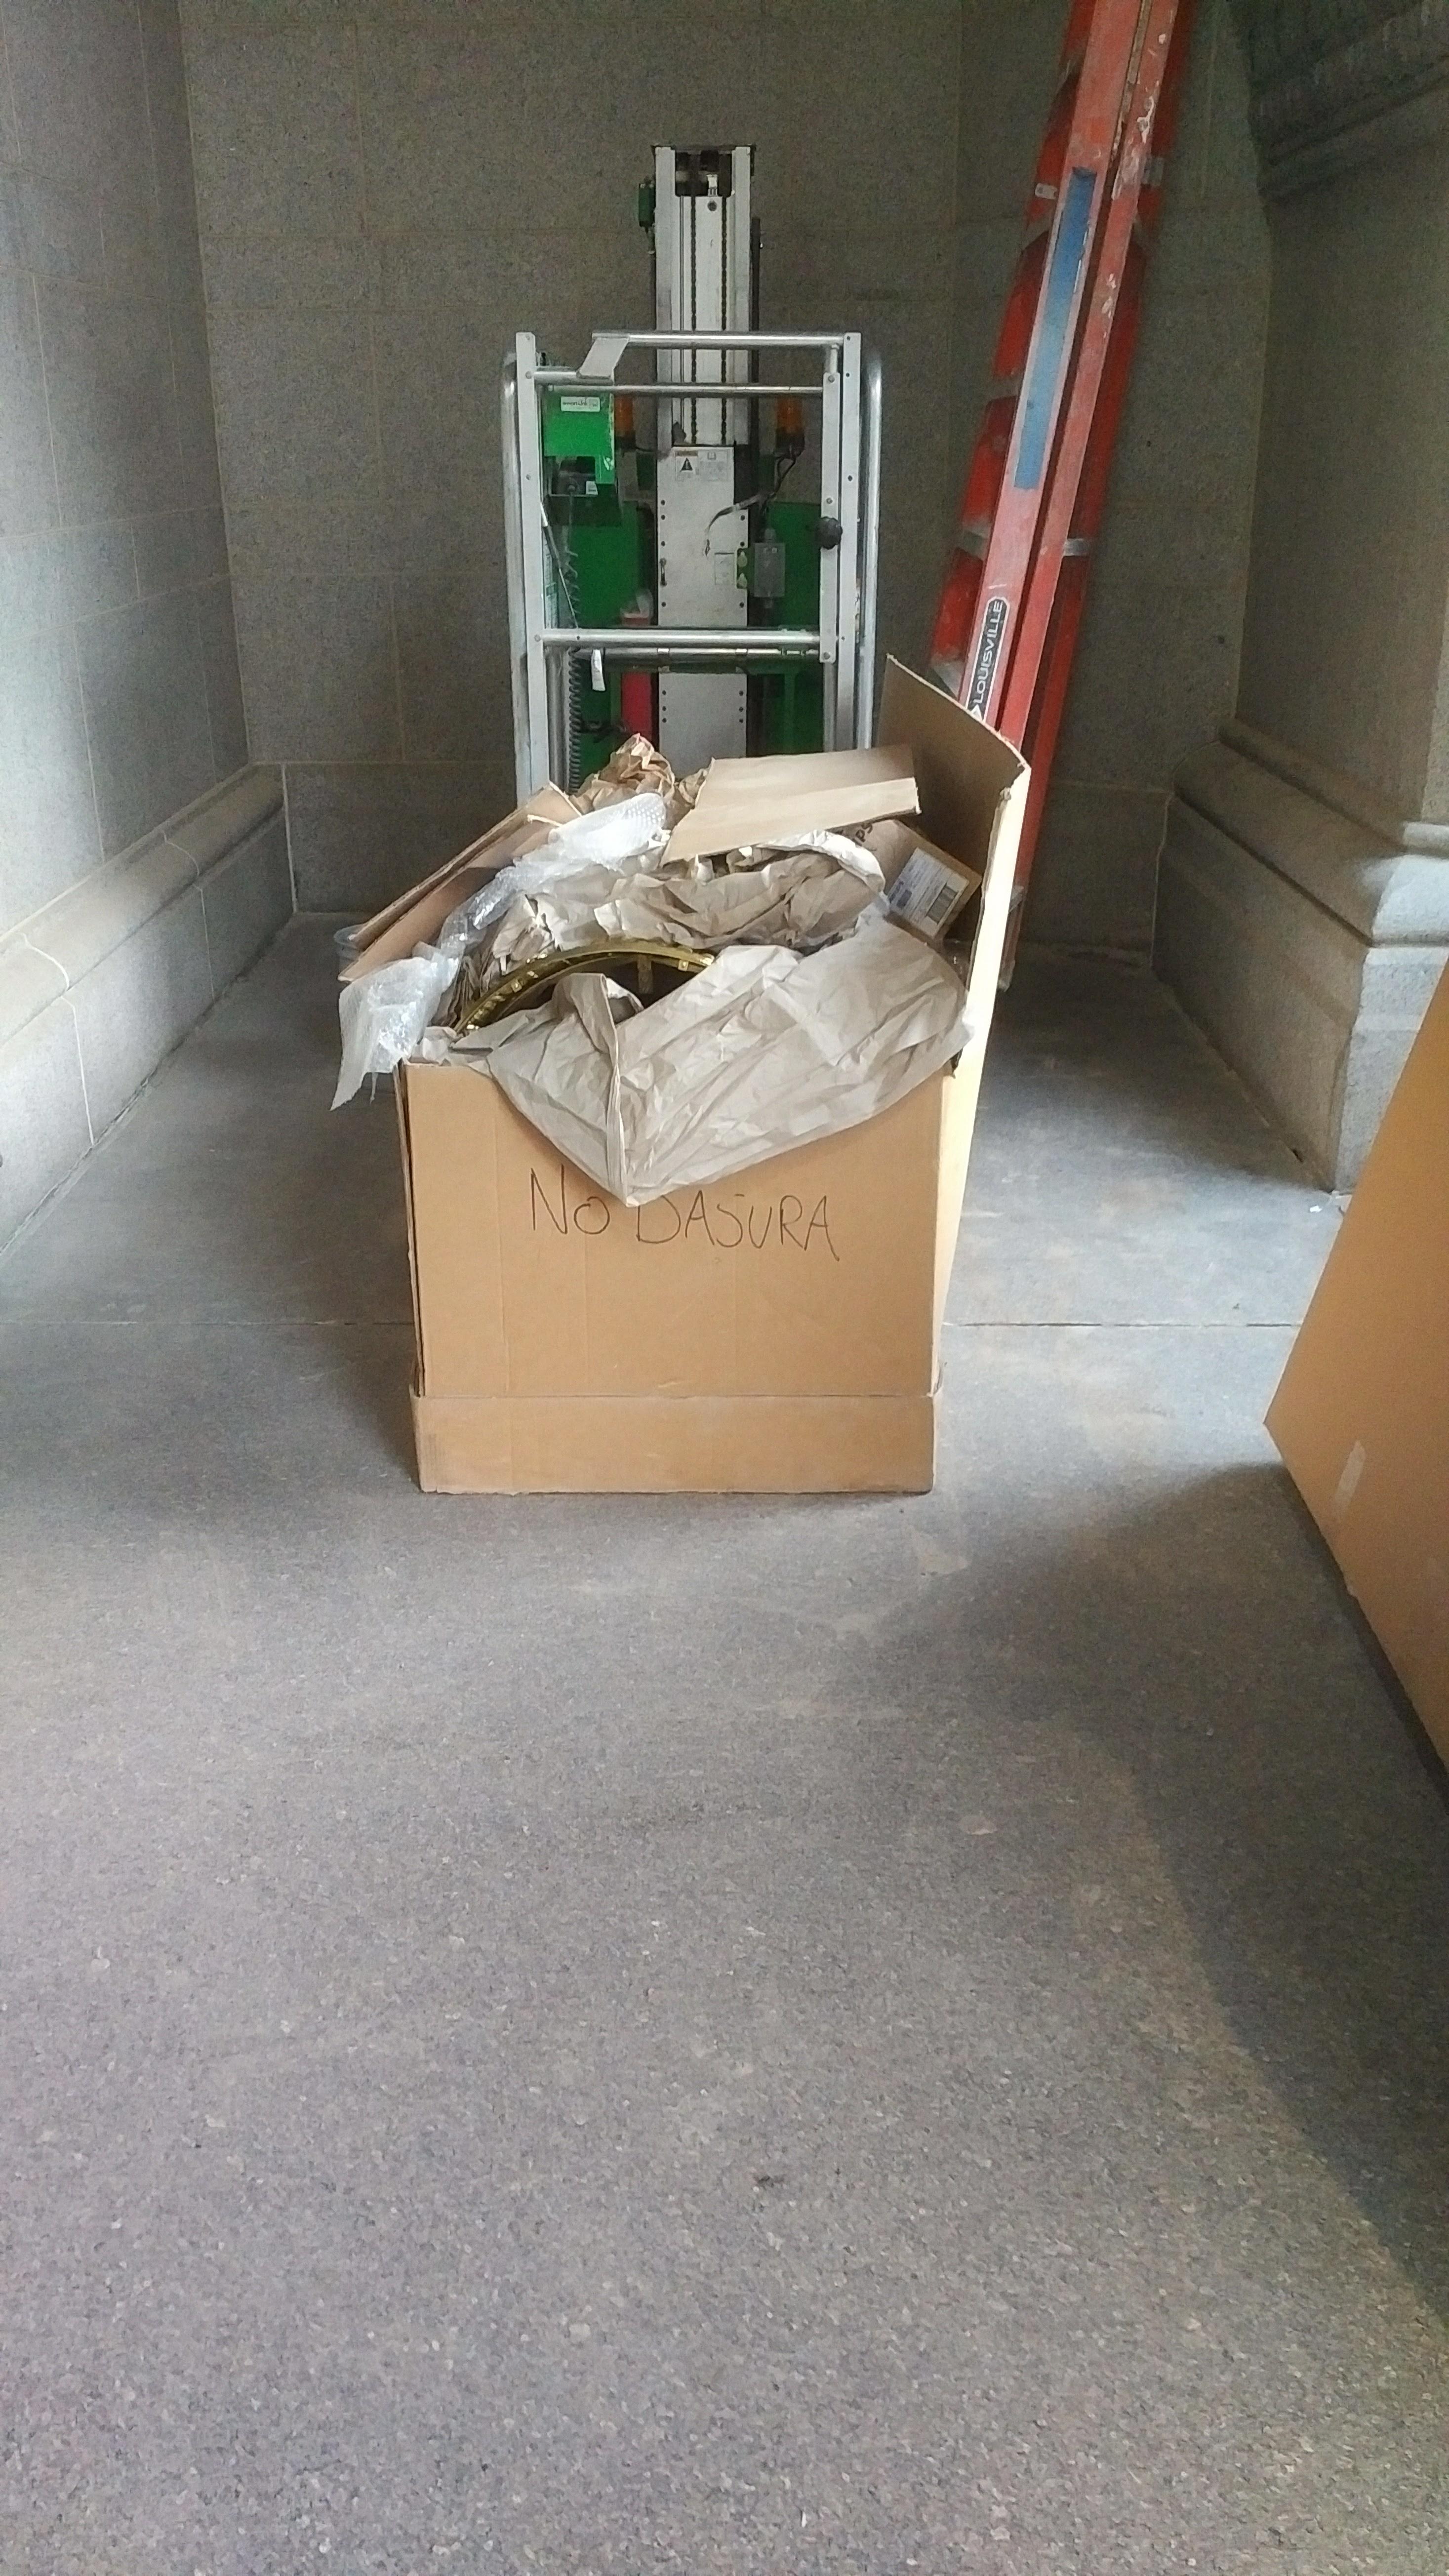 Recycling box titled No Basura